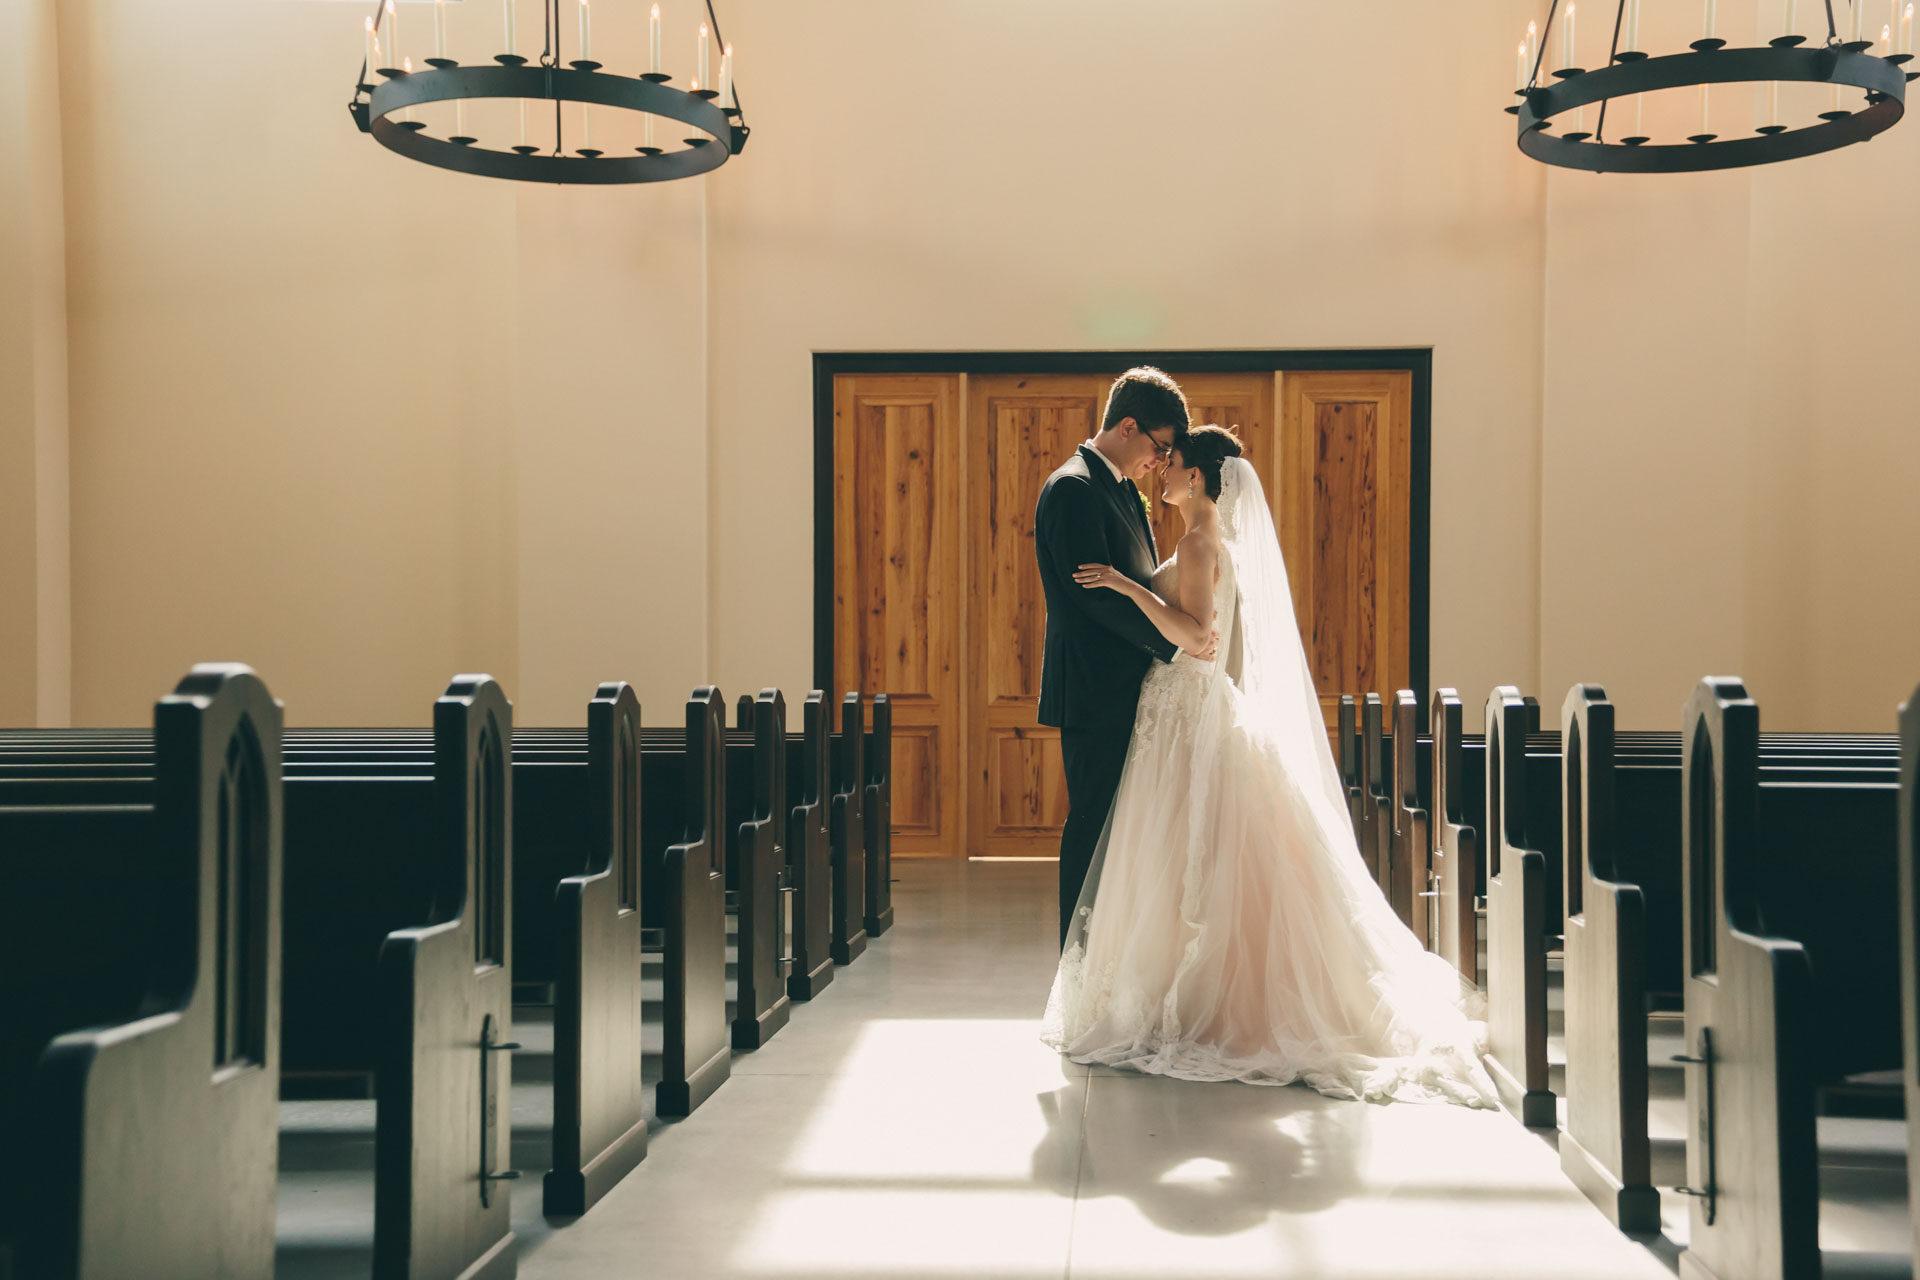 Baptist Wedding Ceremony Order